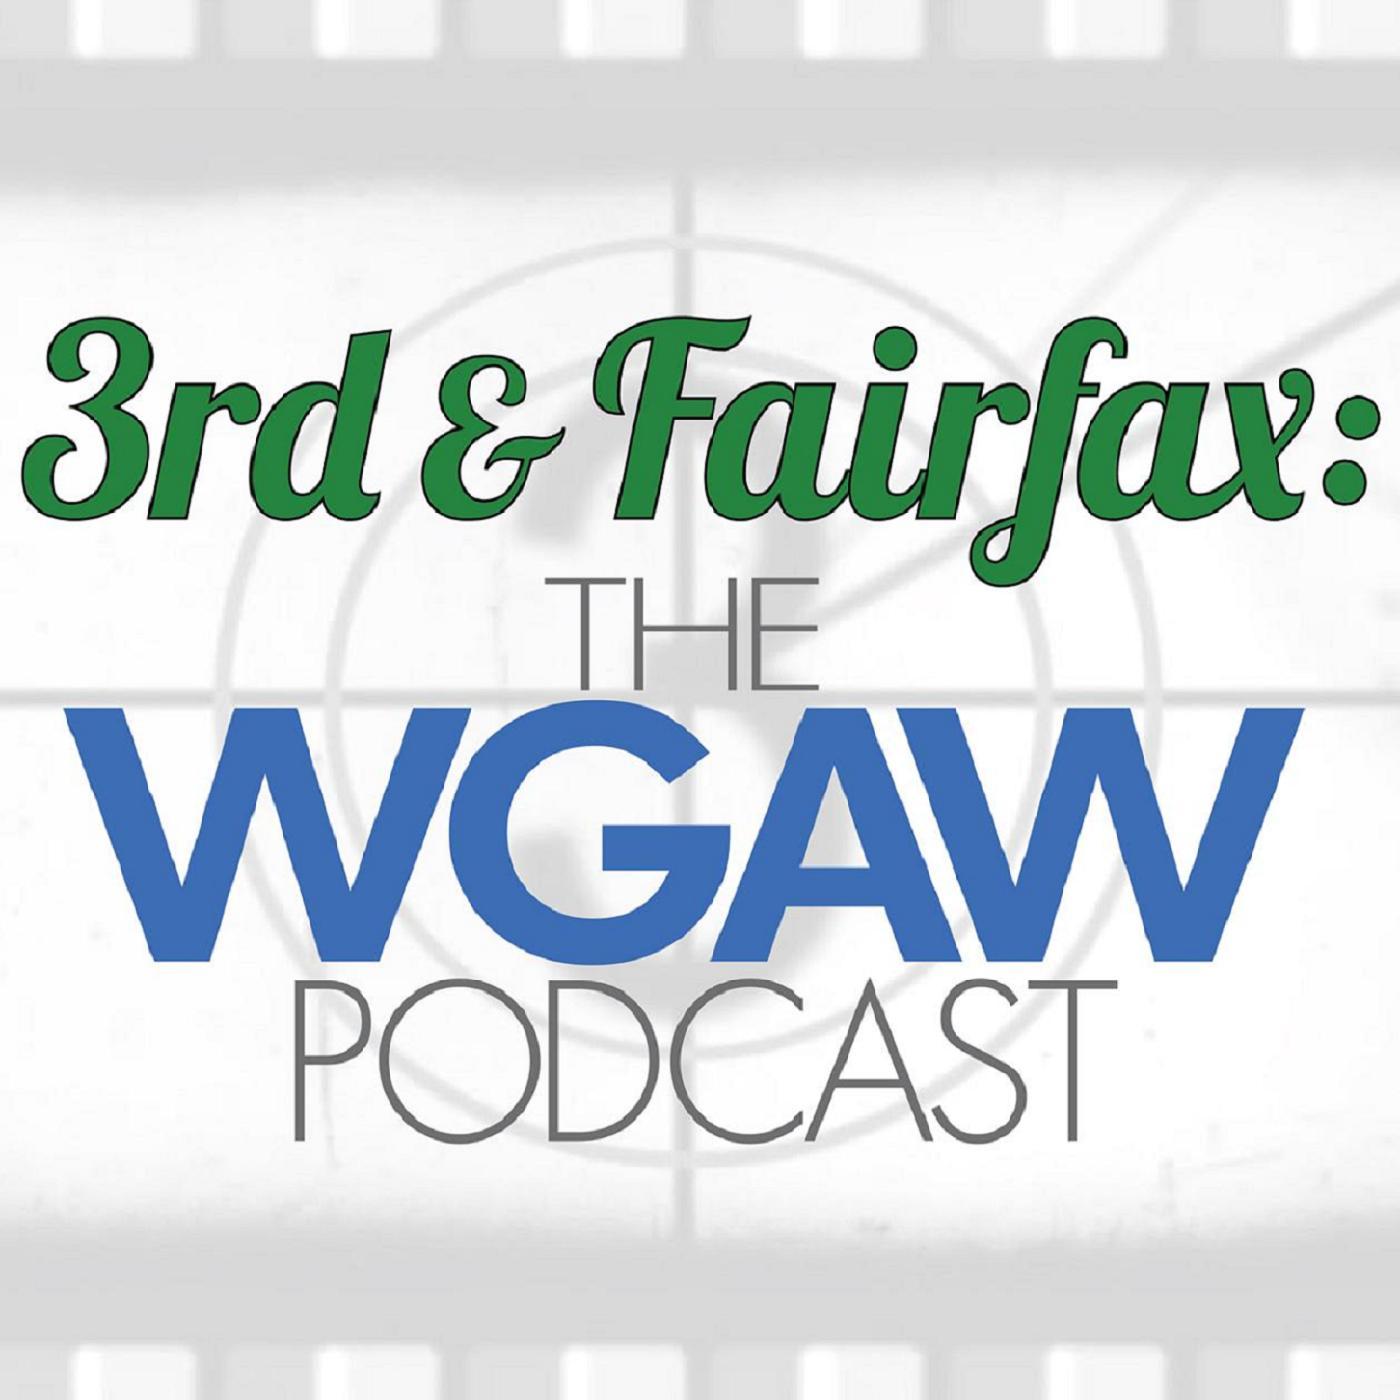 3rd & Fairfax: The WGAW Podcast show art